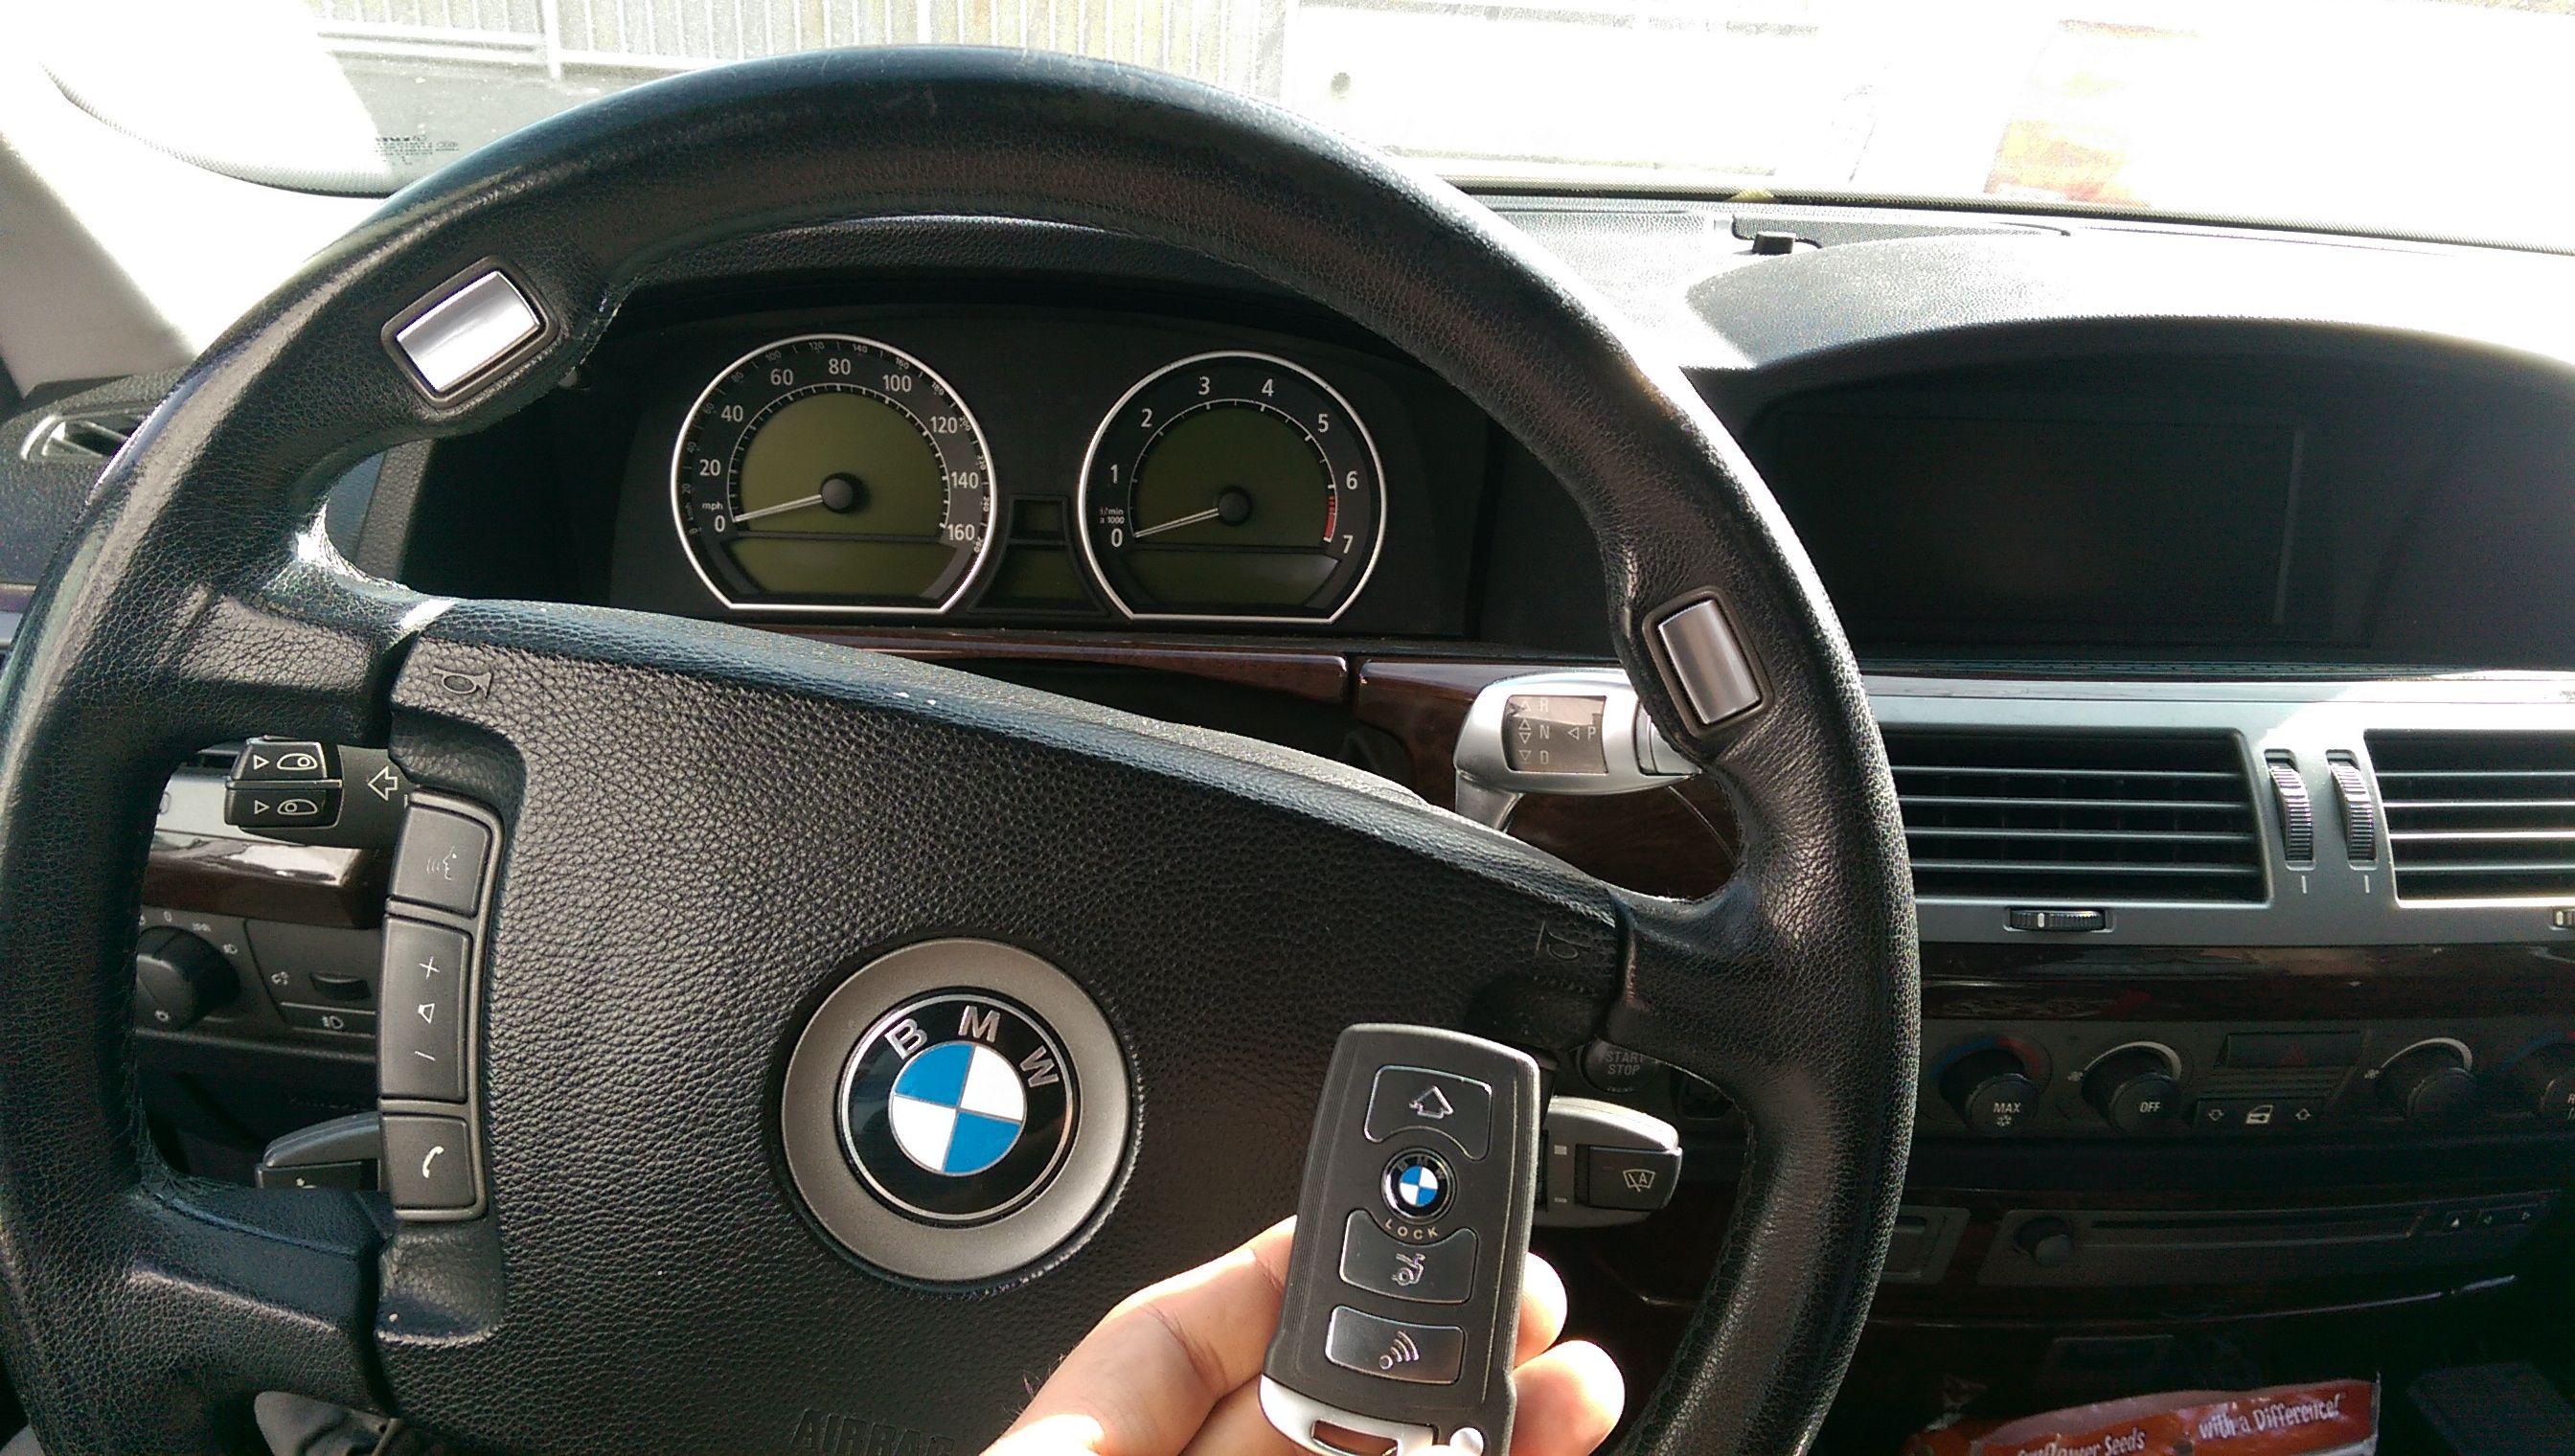 Bmw smart key fob remote bmw key smart key key fob